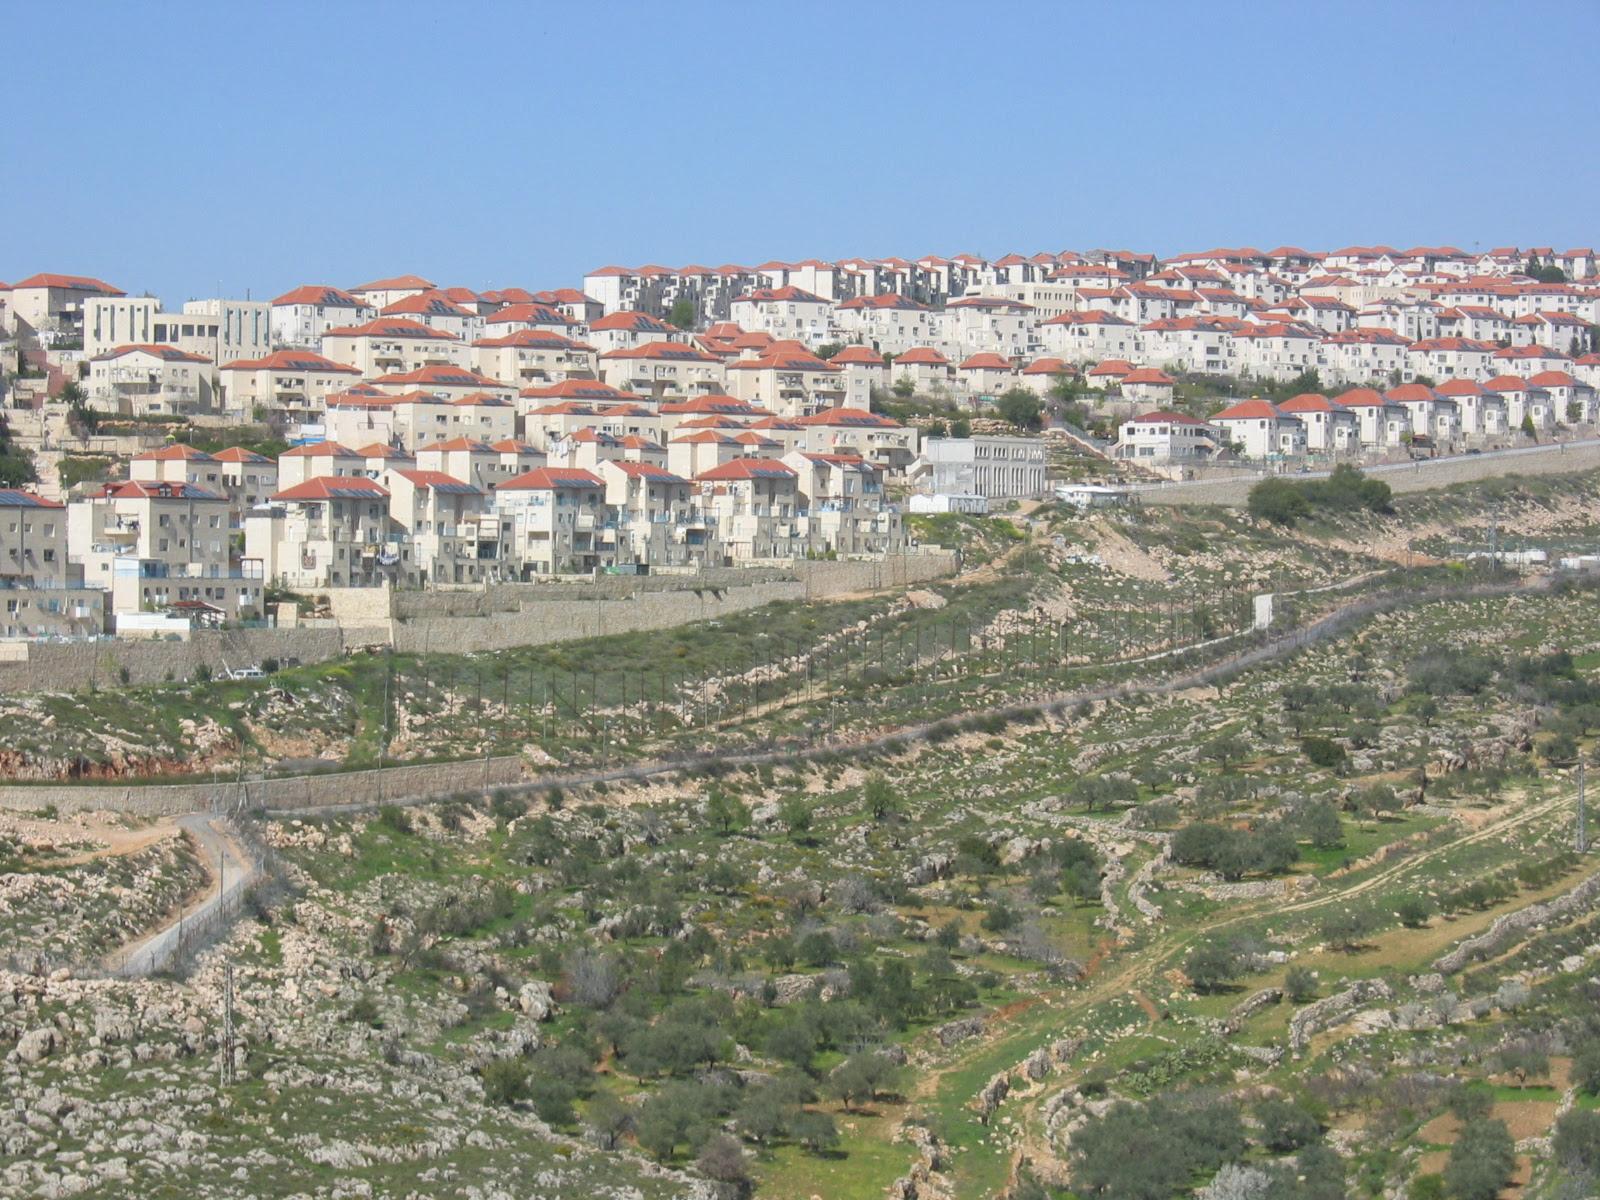 Nahhalin-نحّالين: مستوطنة بيتار المقامة على أراضي نحالين ,حوسان ووادي فوكين